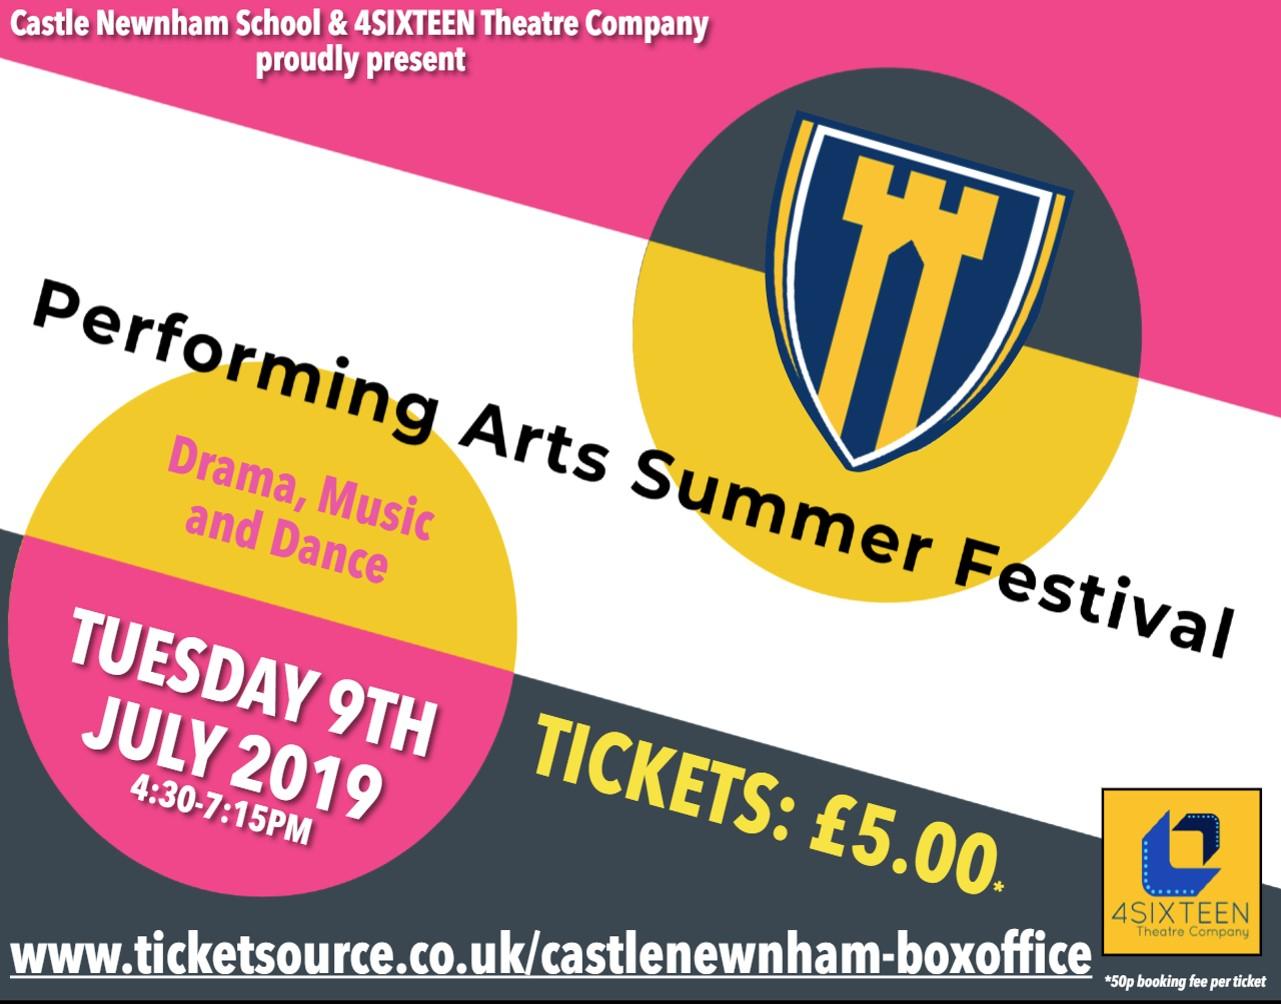 Performing Arts Summer Festival banner image